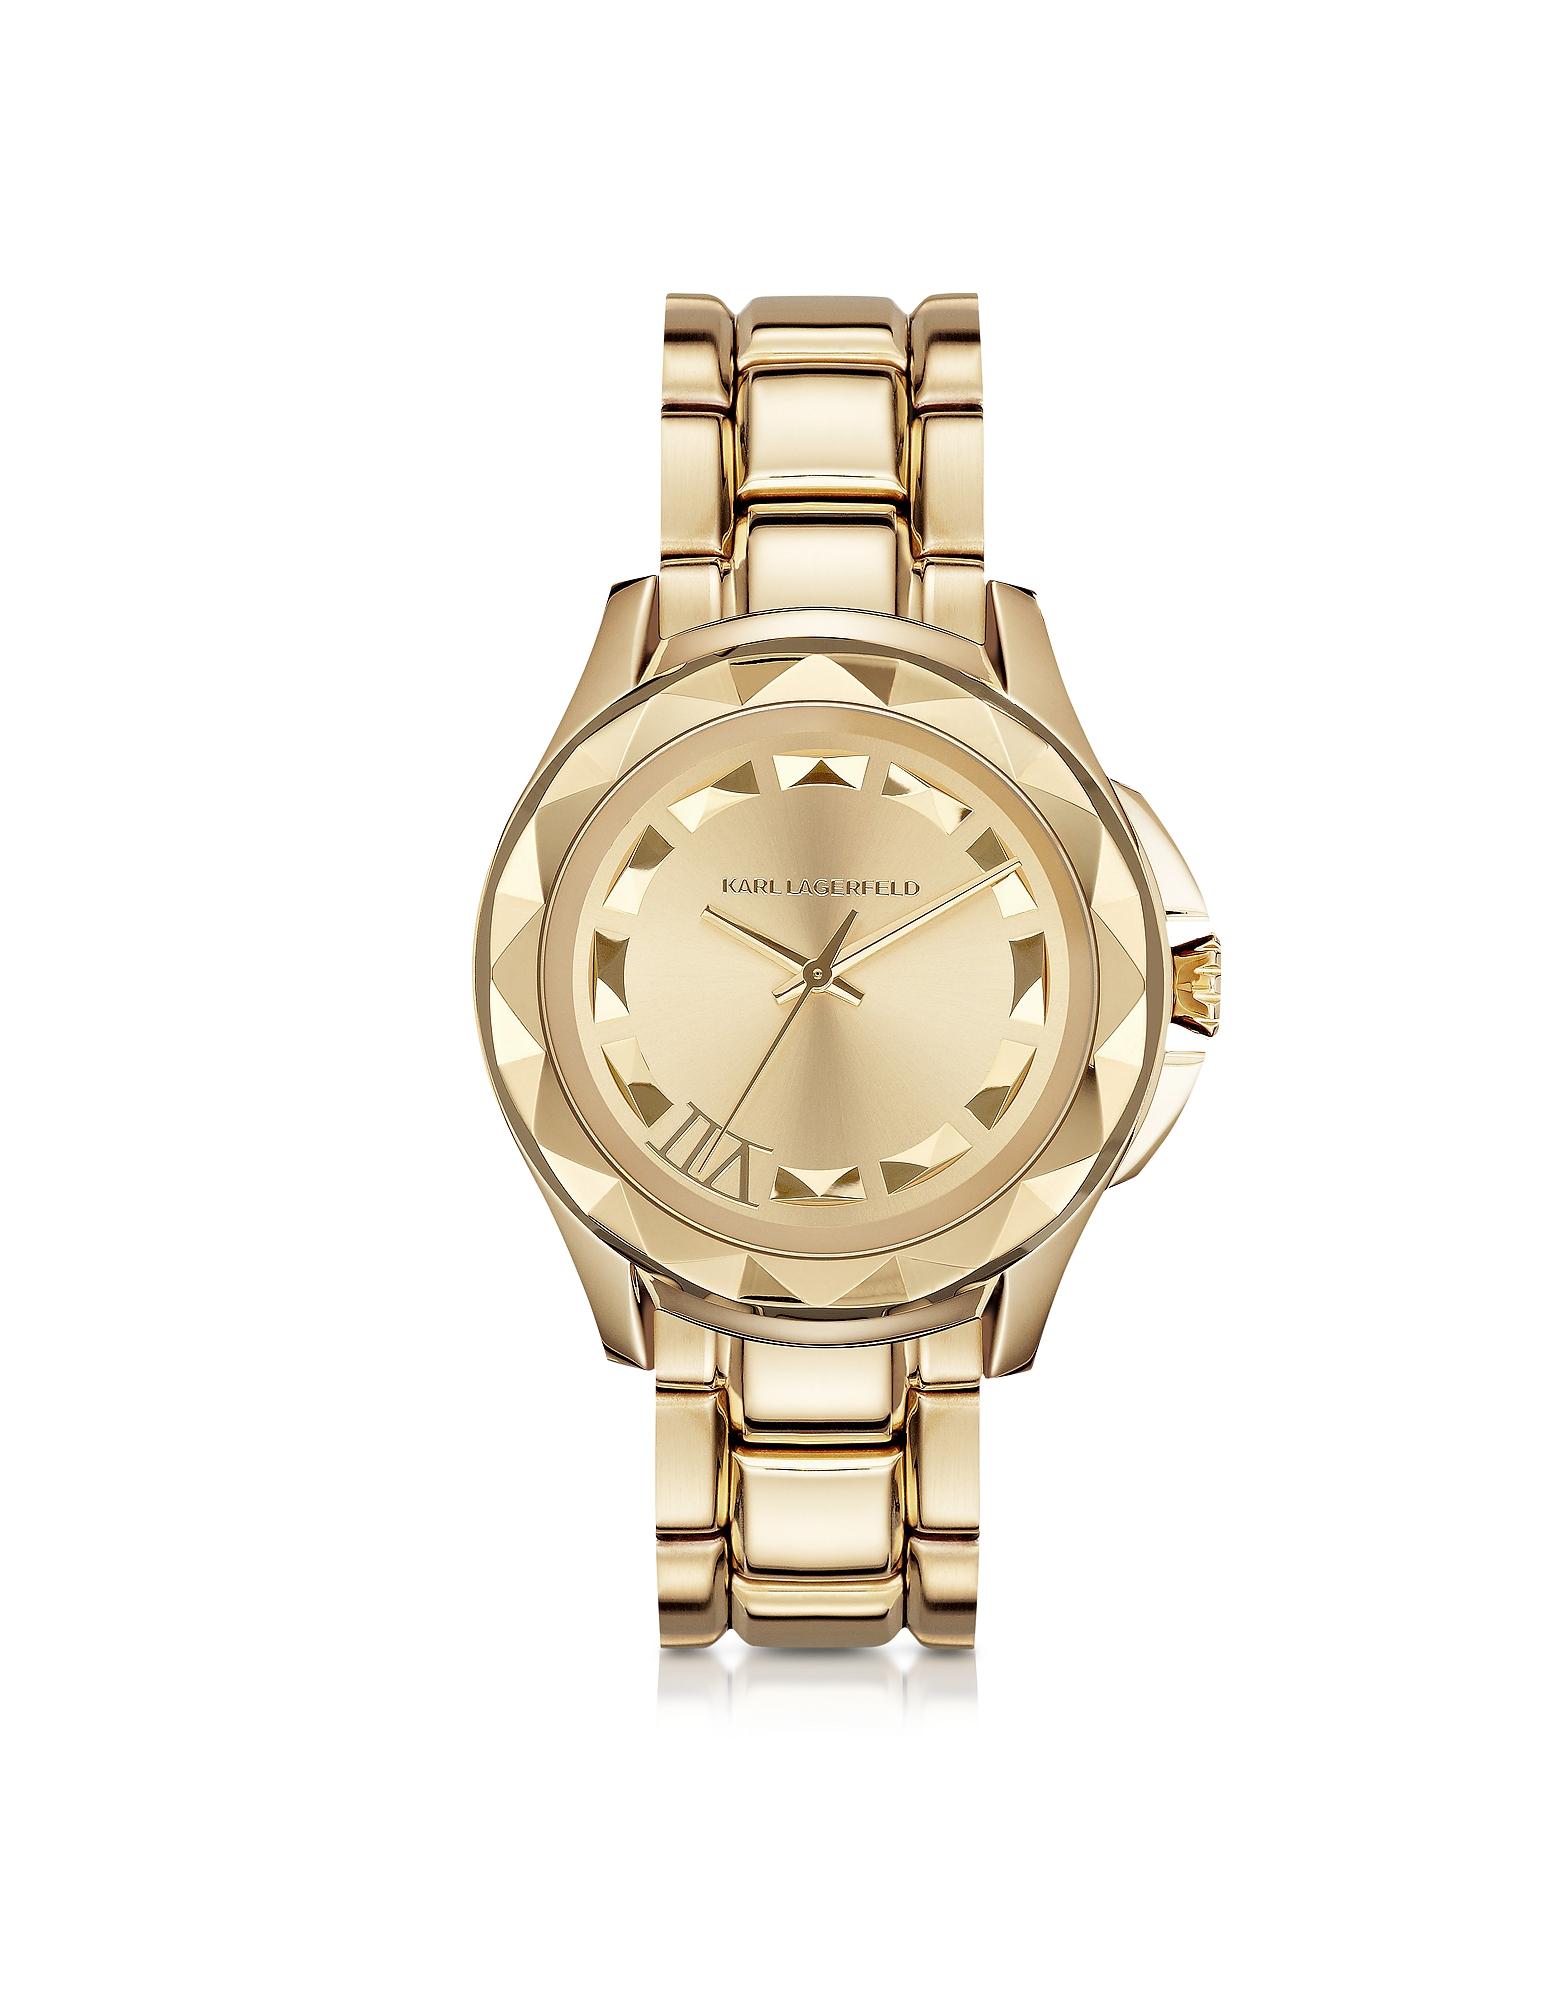 Karl Lagerfeld Women's Watches, Karl 7 43.5mm Gold IP Stainless Steel Unisex Watch